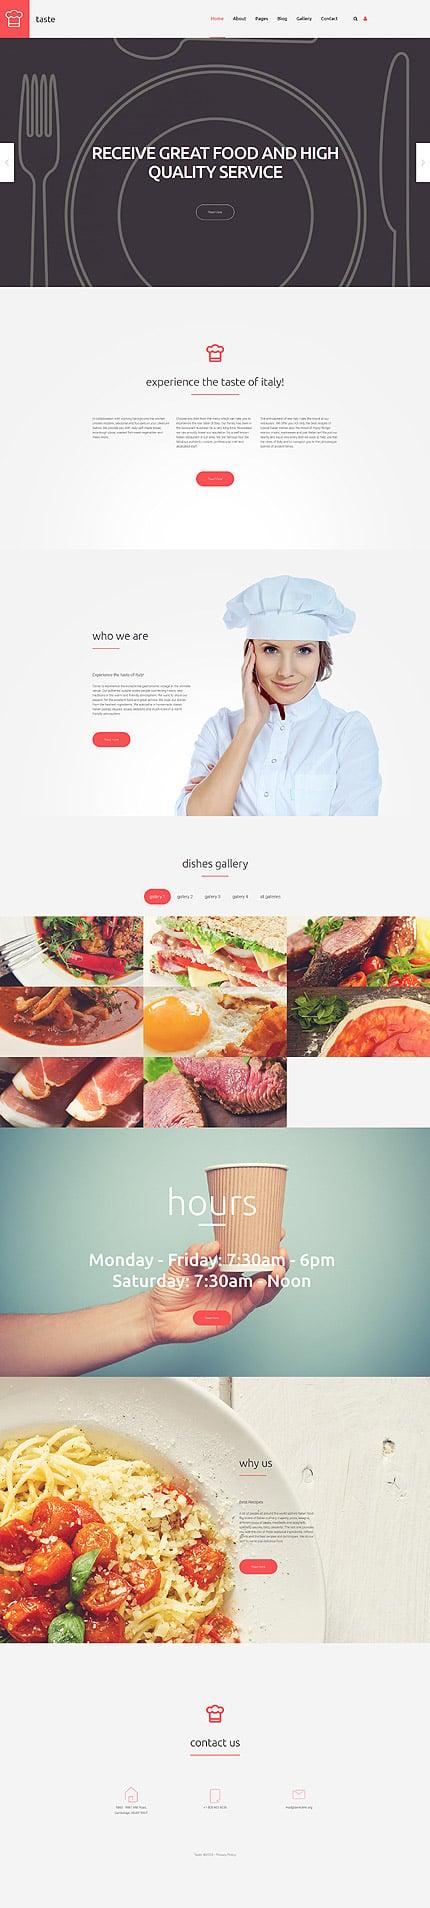 Joomla Theme/Template 58019 Main Page Screenshot